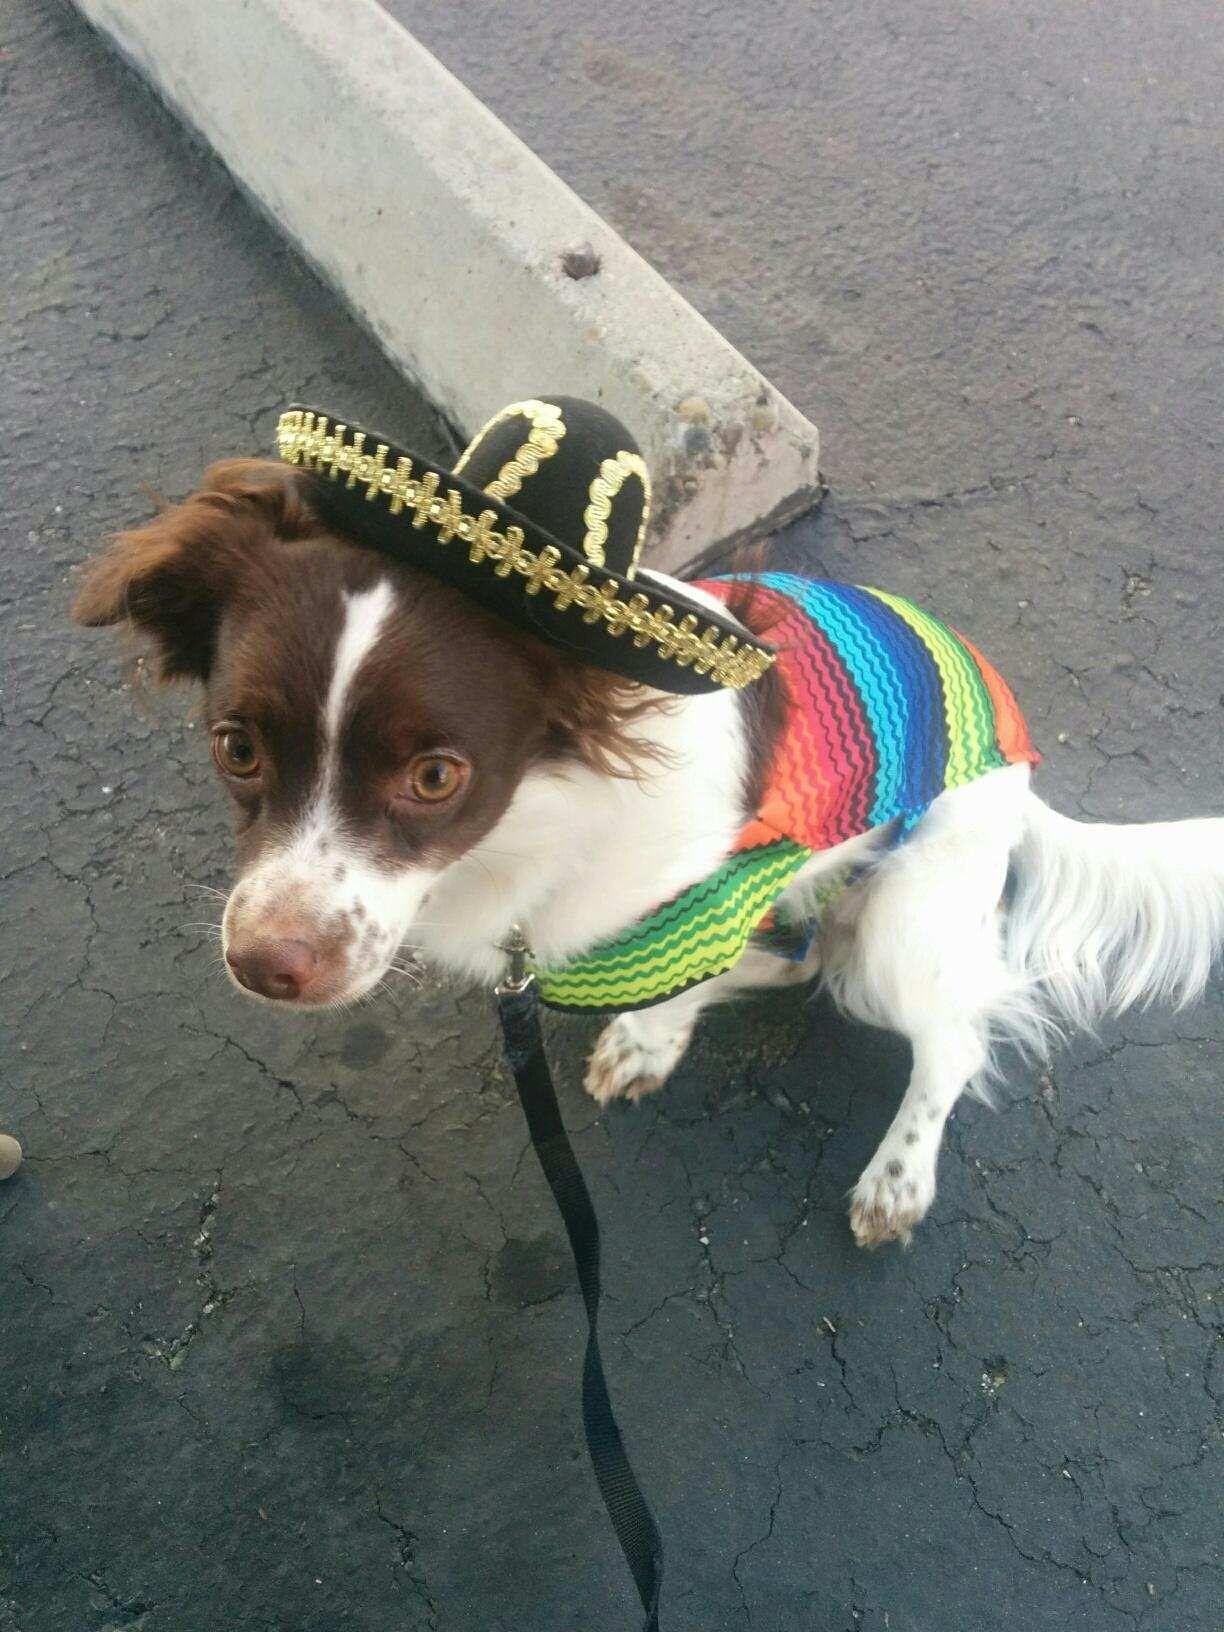 Happy Cinco de Mayo! OC http://ift.tt/2q8VxRf